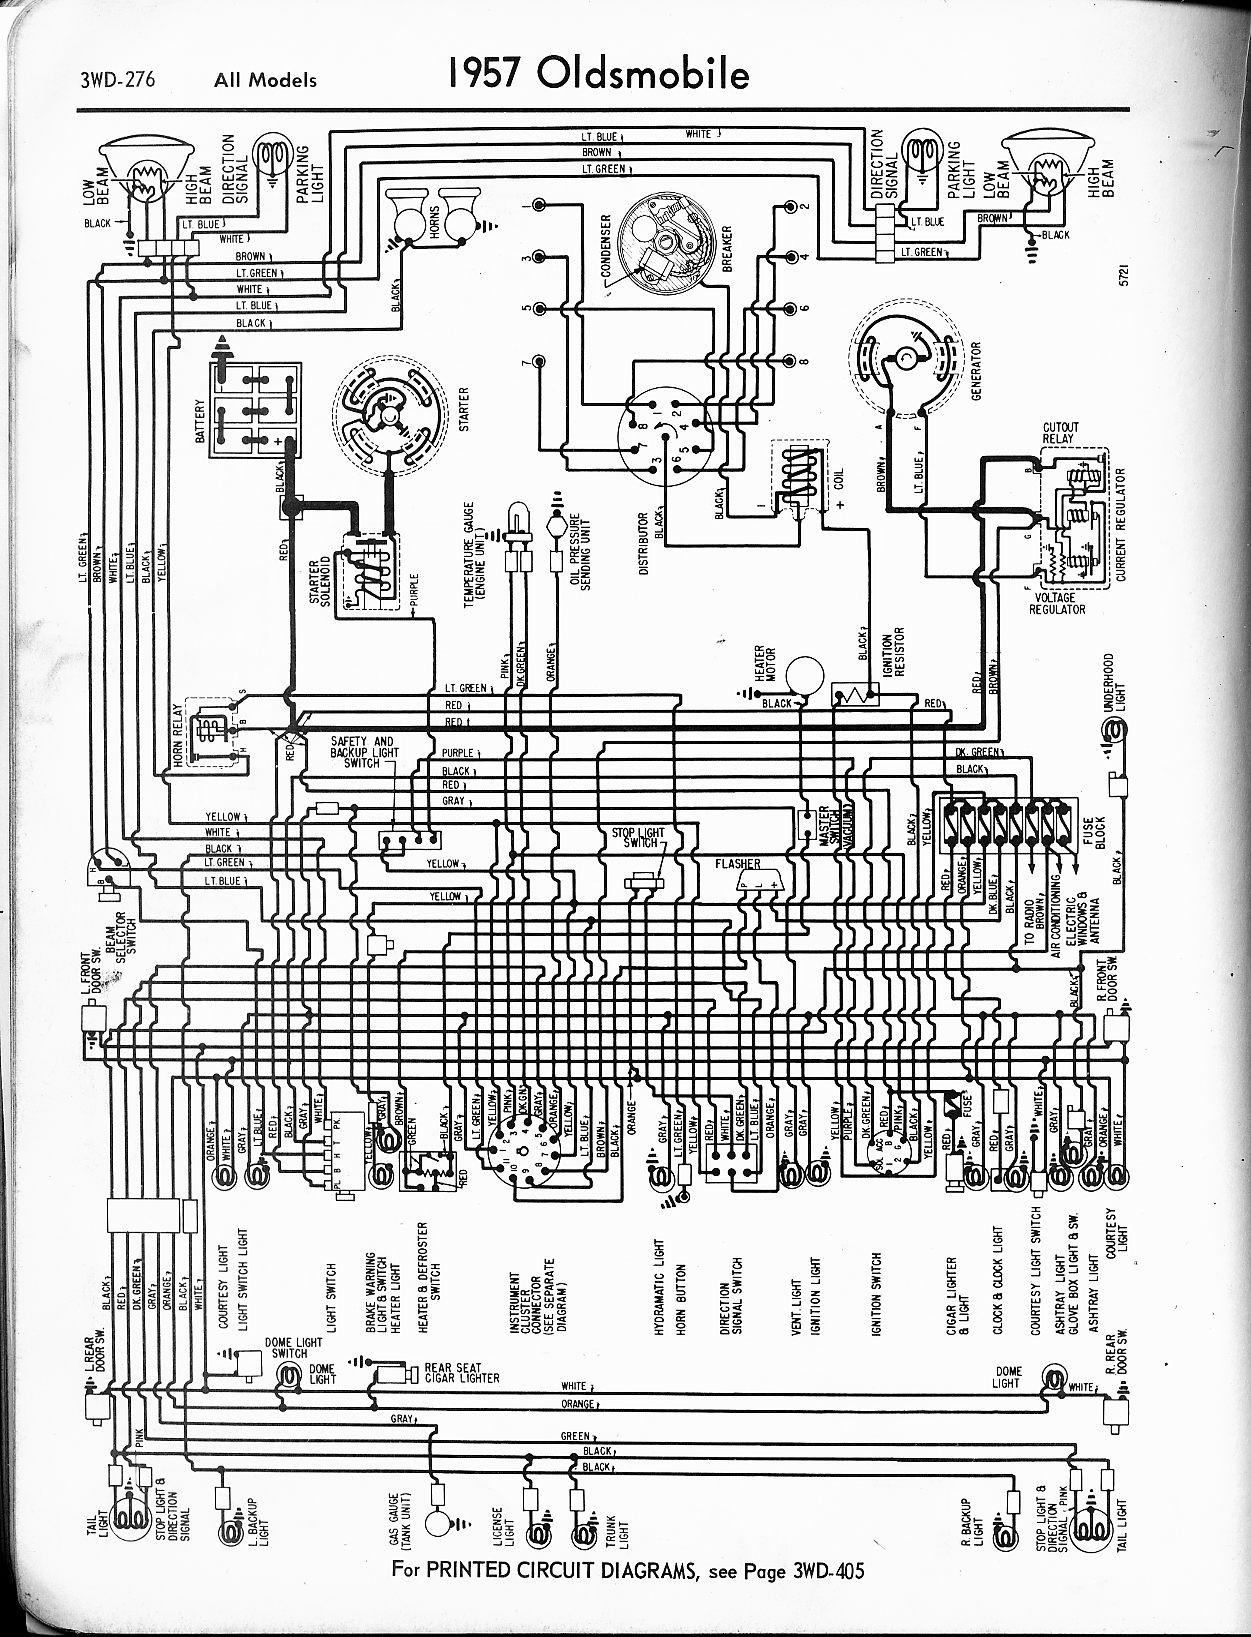 hight resolution of pontiac 3800 engine diagram wiring diagram besides 1996 oldsmobile cutlass engine wiring diagram of pontiac 3800